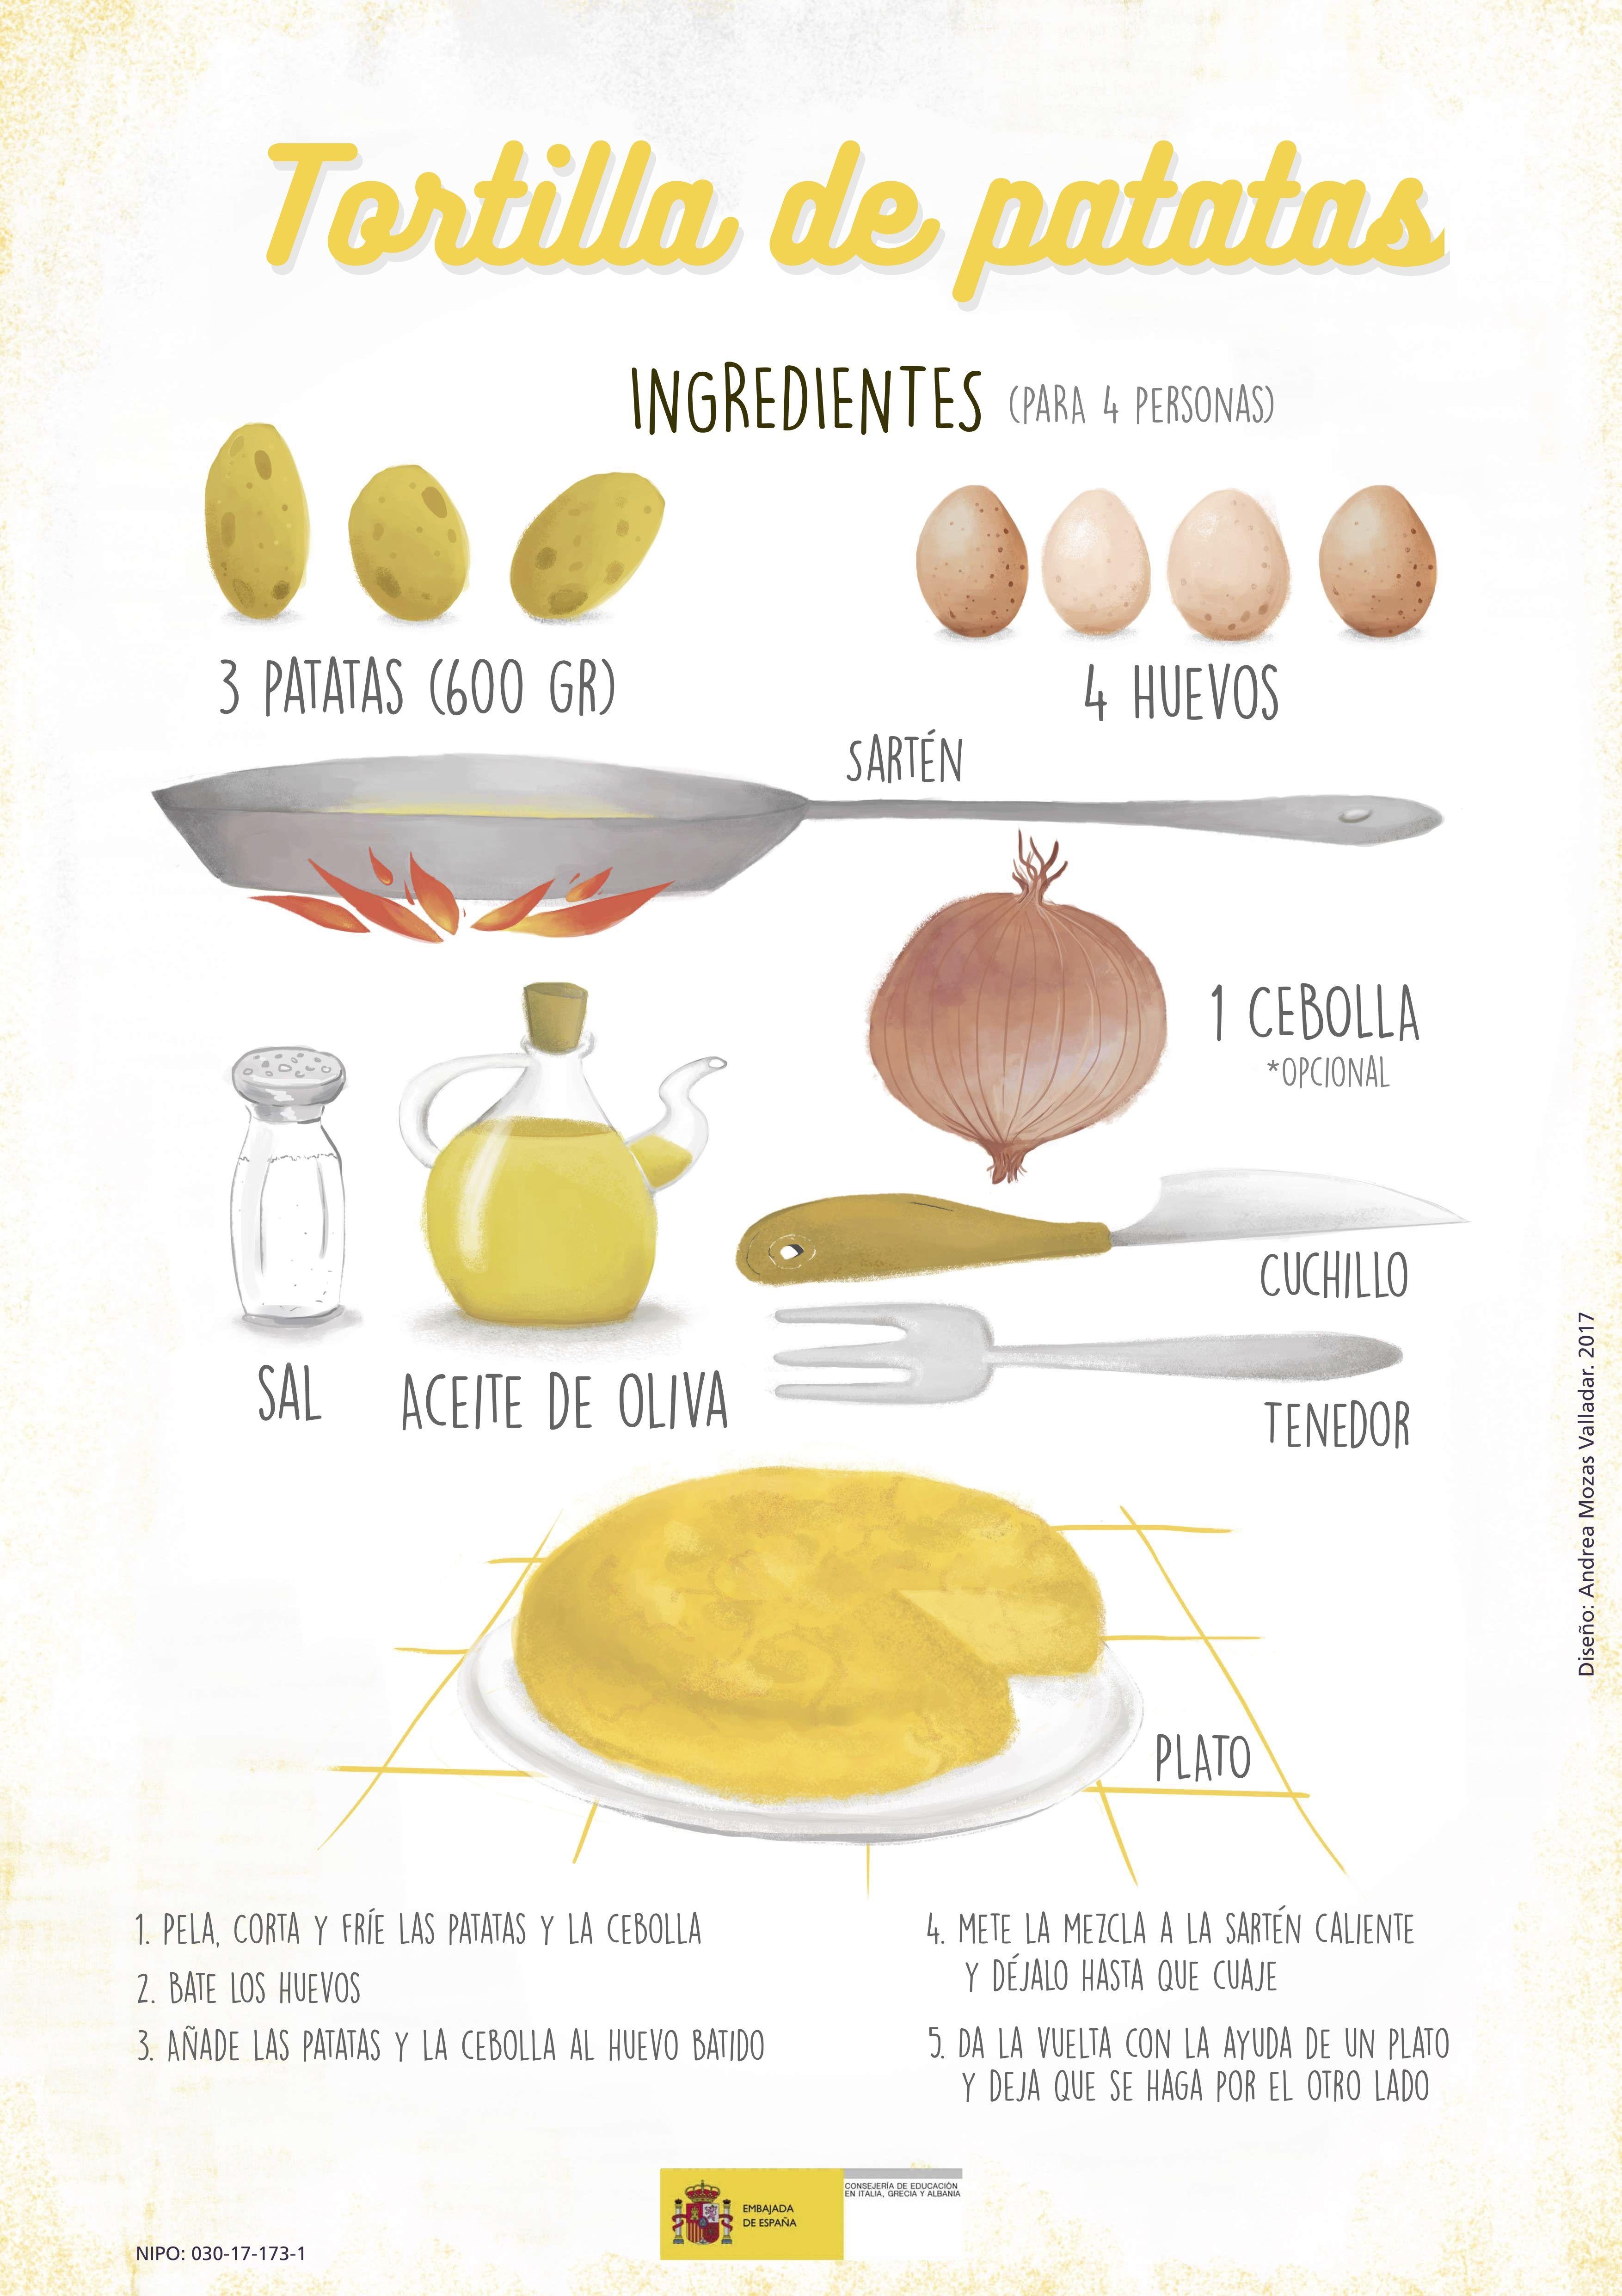 4423938c71736c9658d0c18667f753e6 - Tortillas De Patatas Recetas